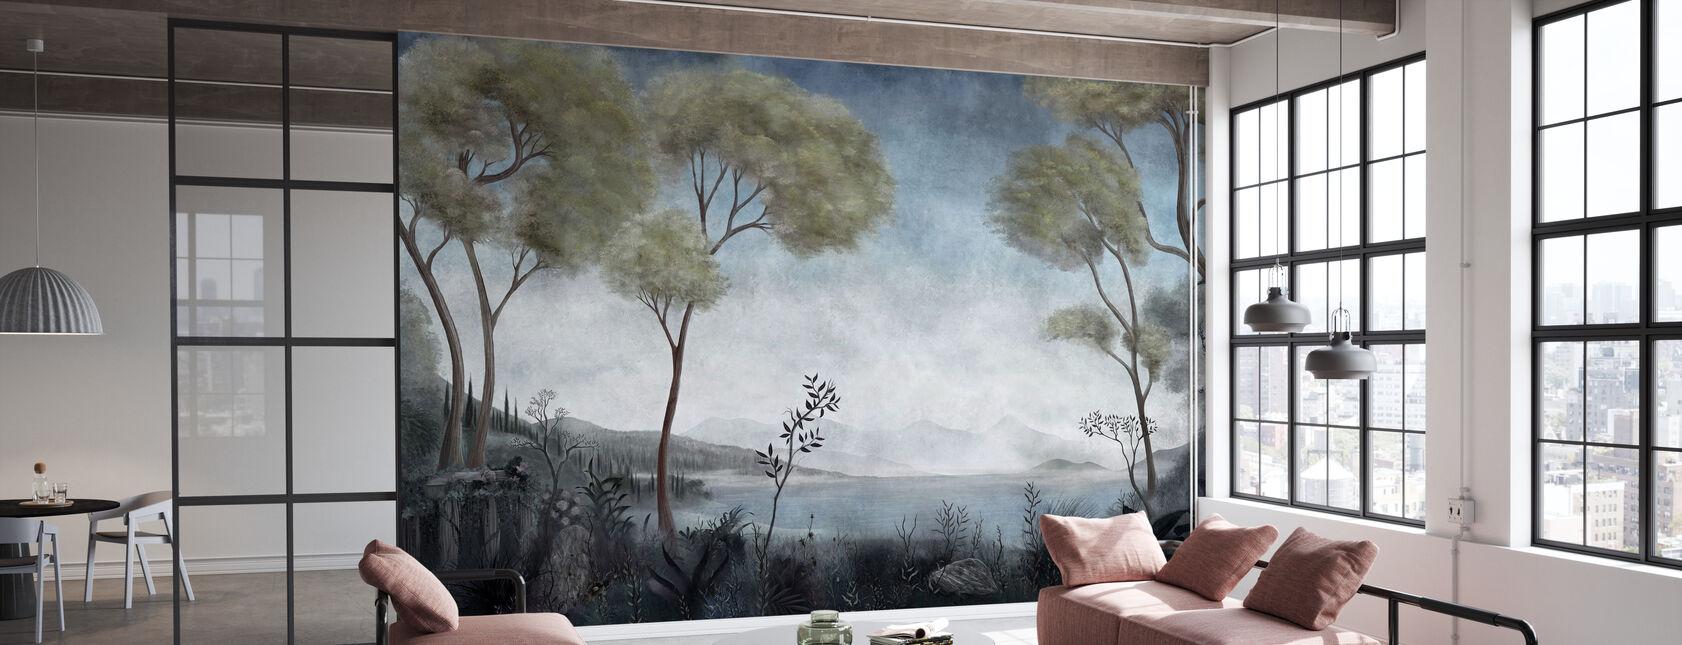 Lake Como - Wallpaper - Office